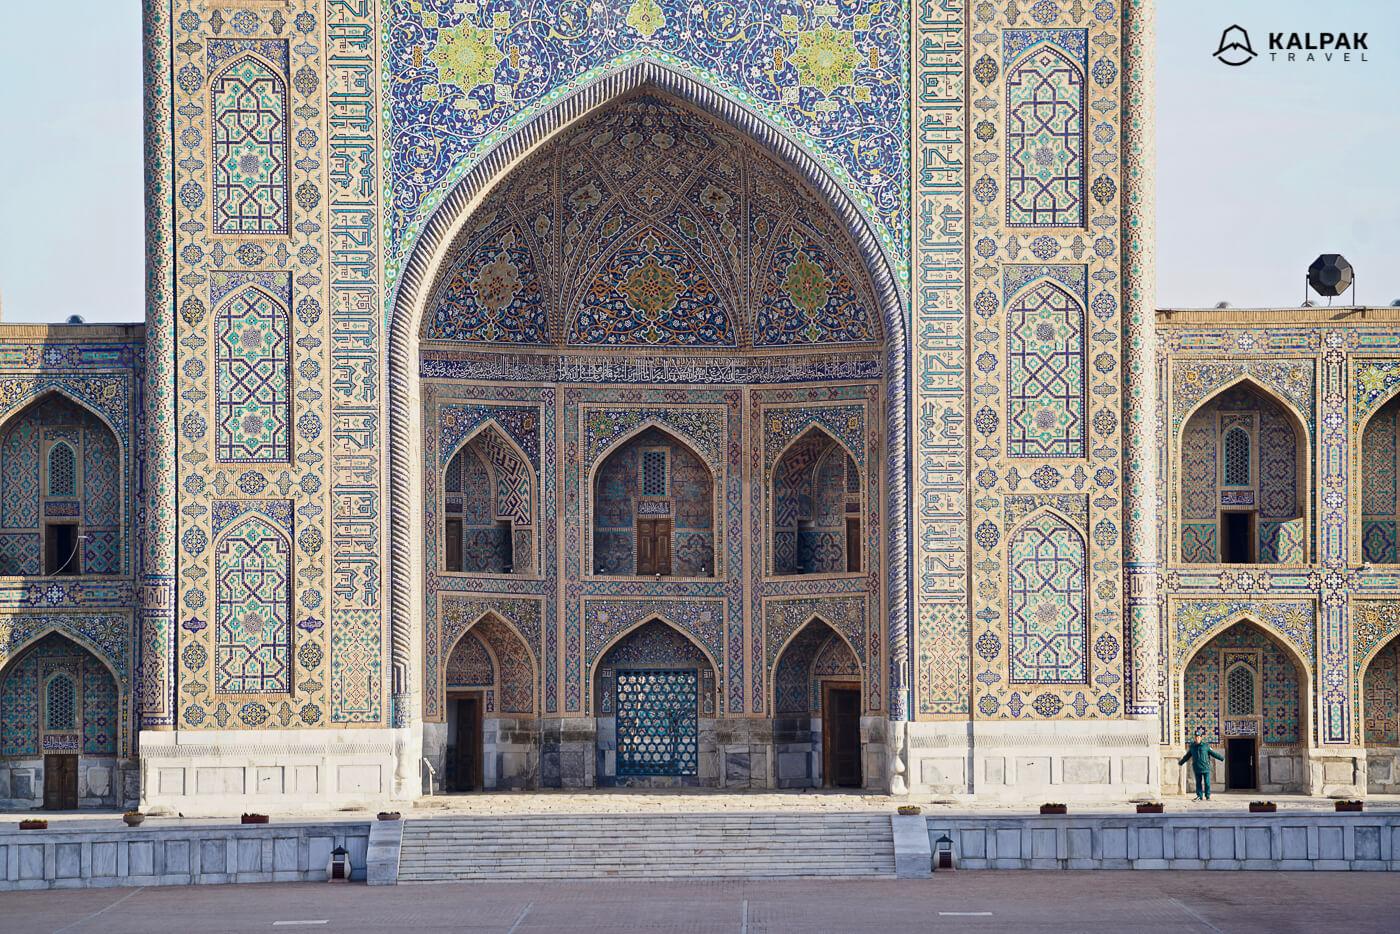 Tillya Kori in Registan, the central building